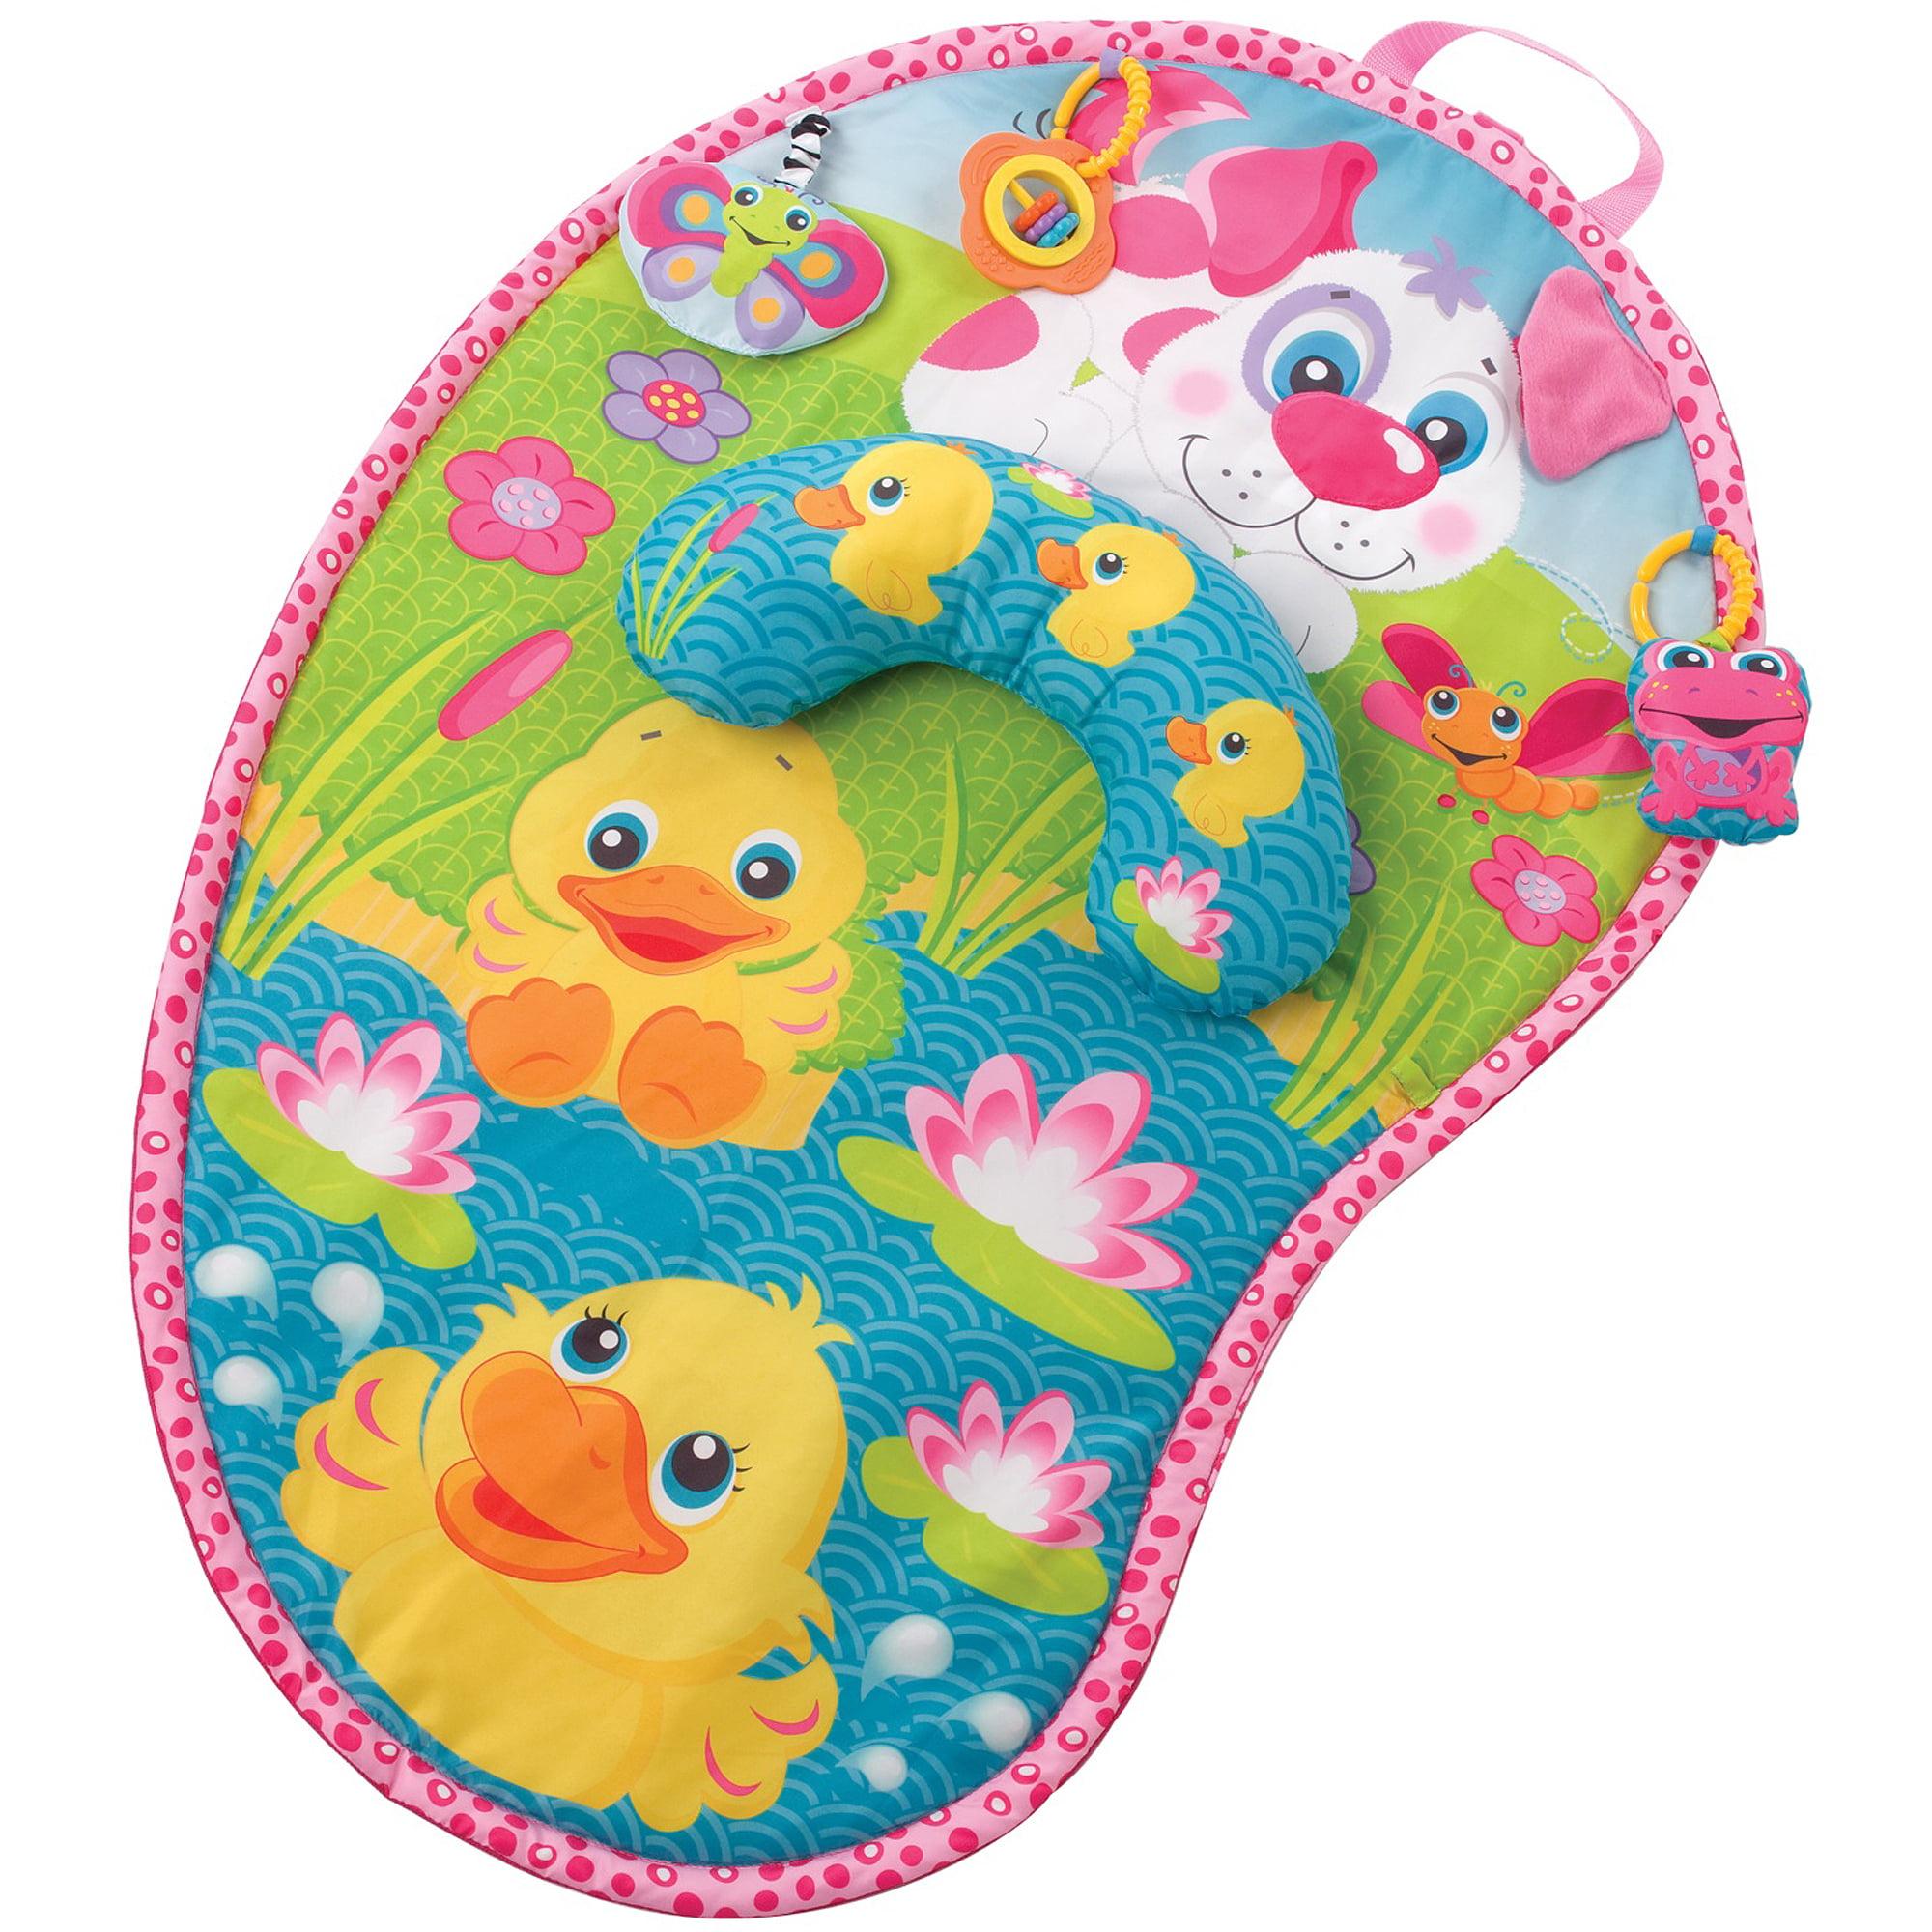 Playgro Pink Puppy Tummy Mat